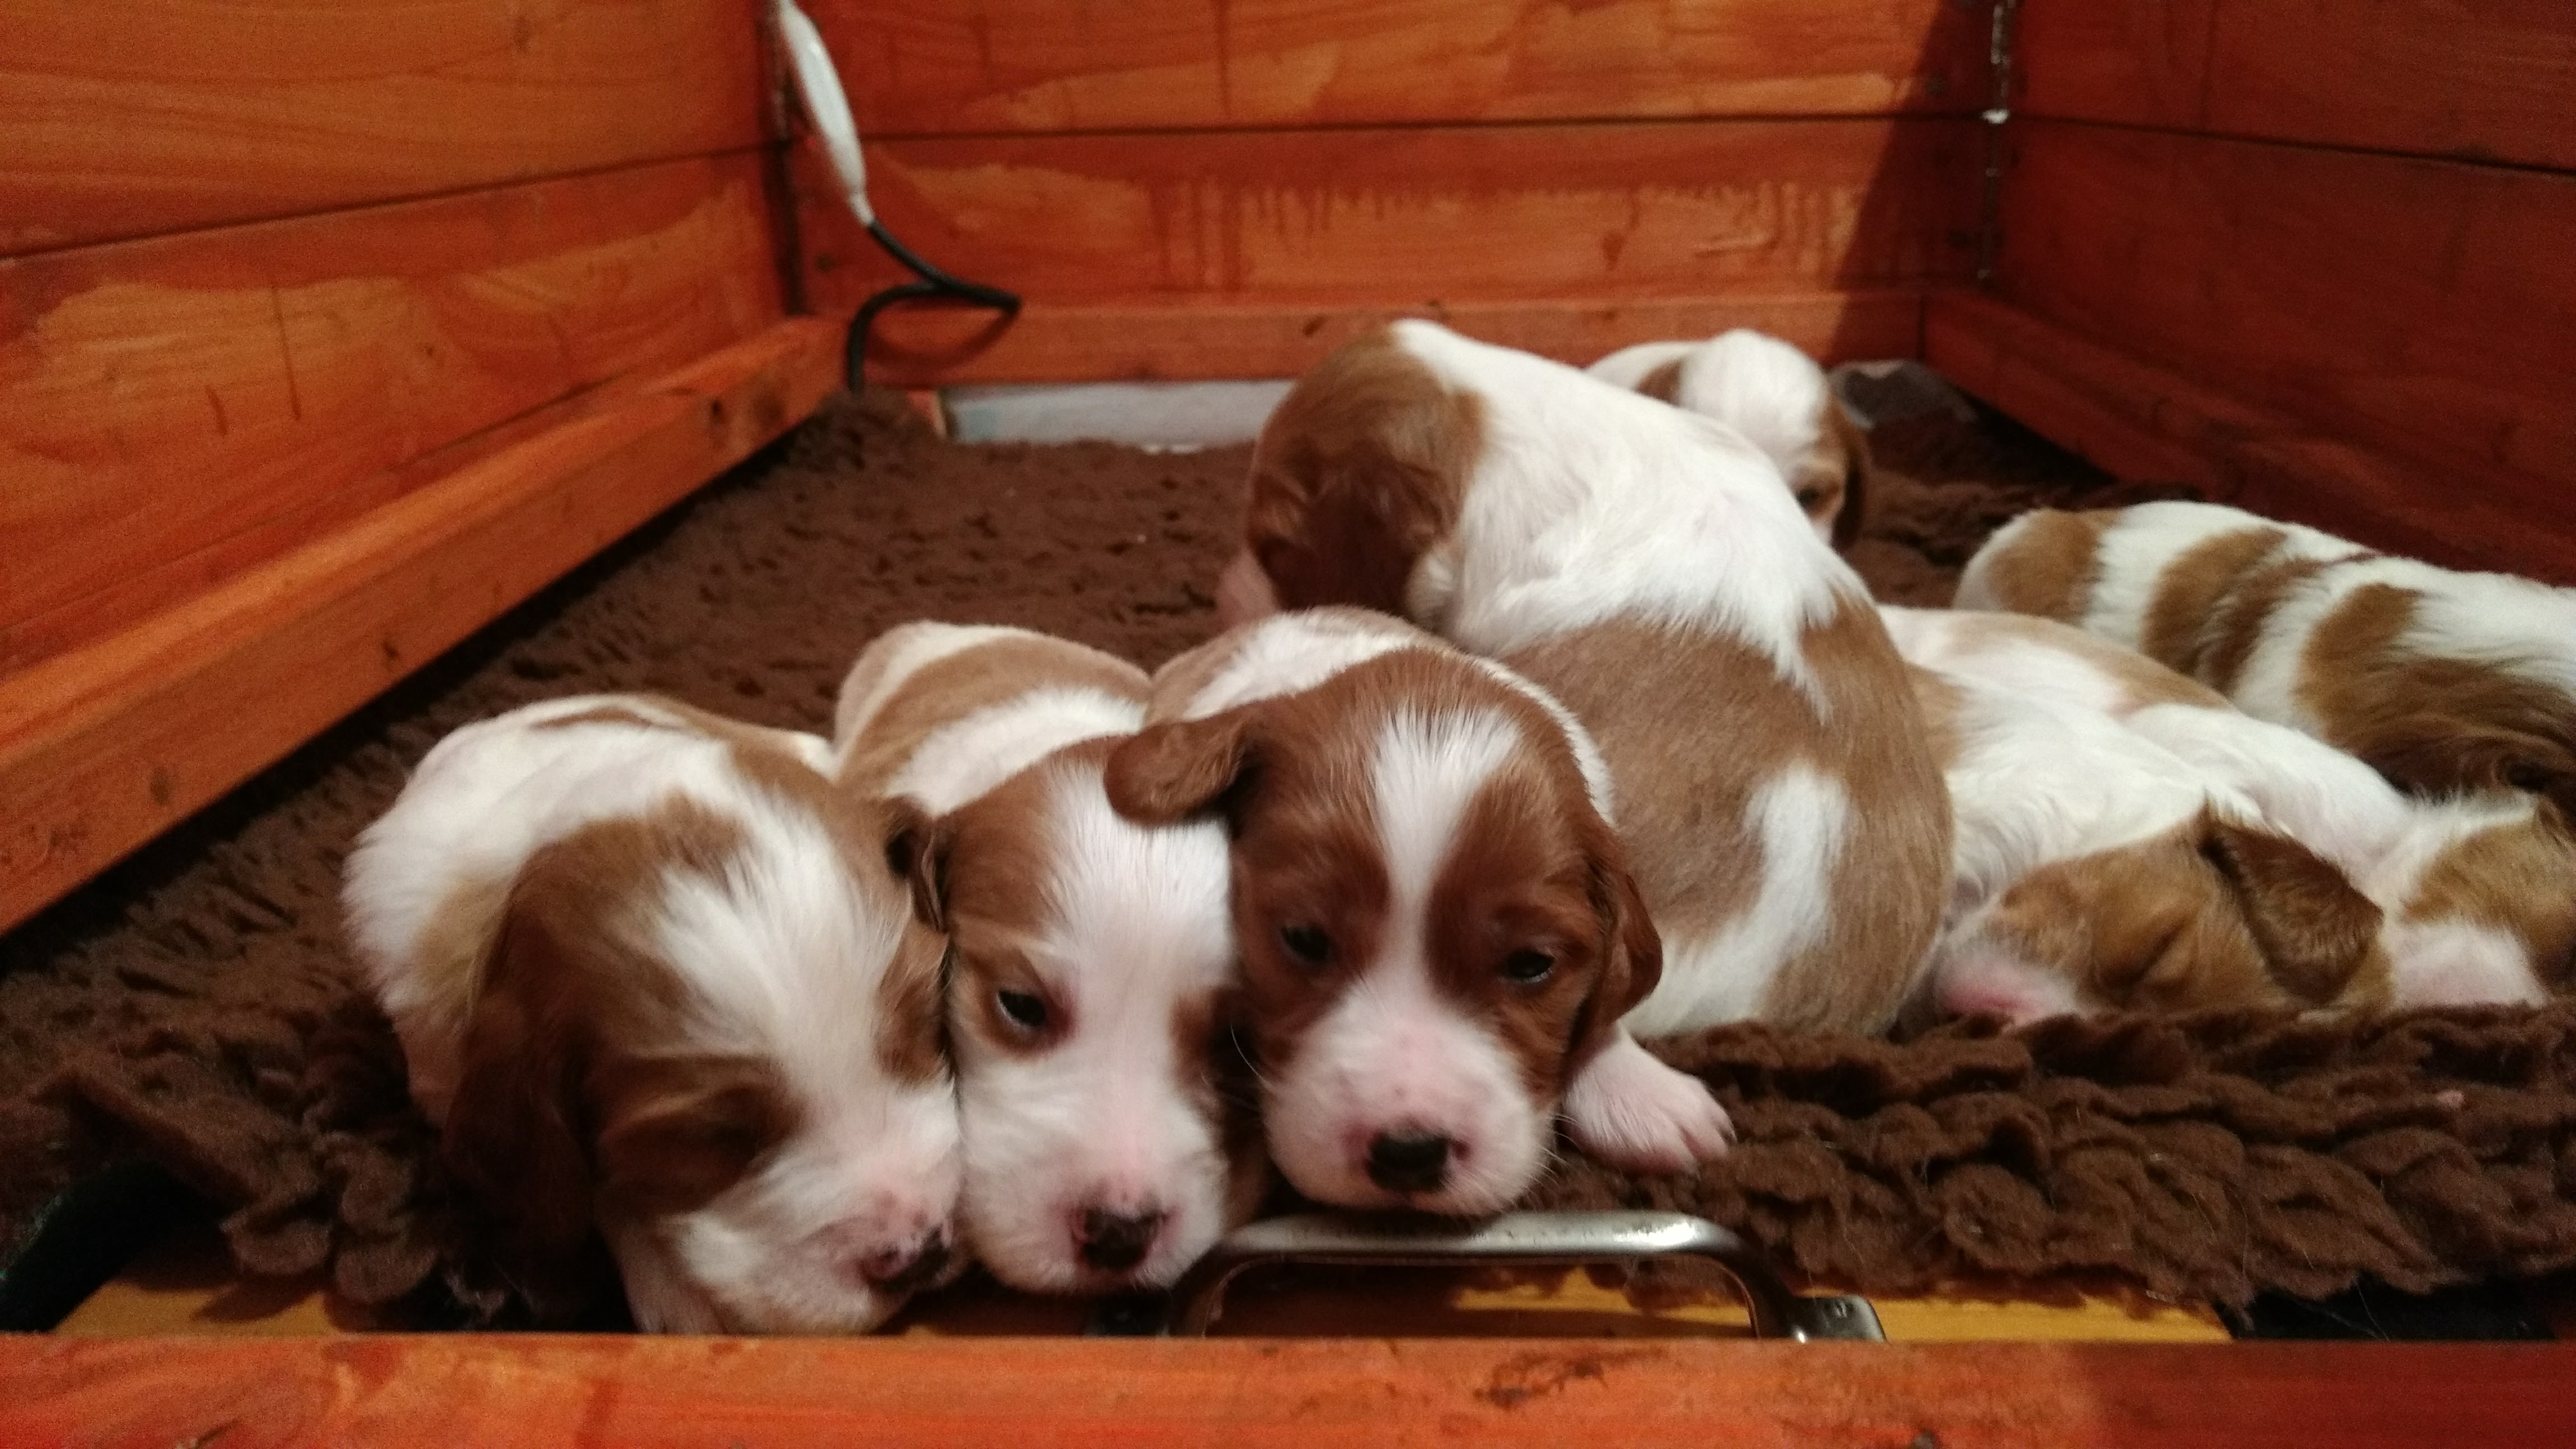 19 days old IRWS B litter puppies